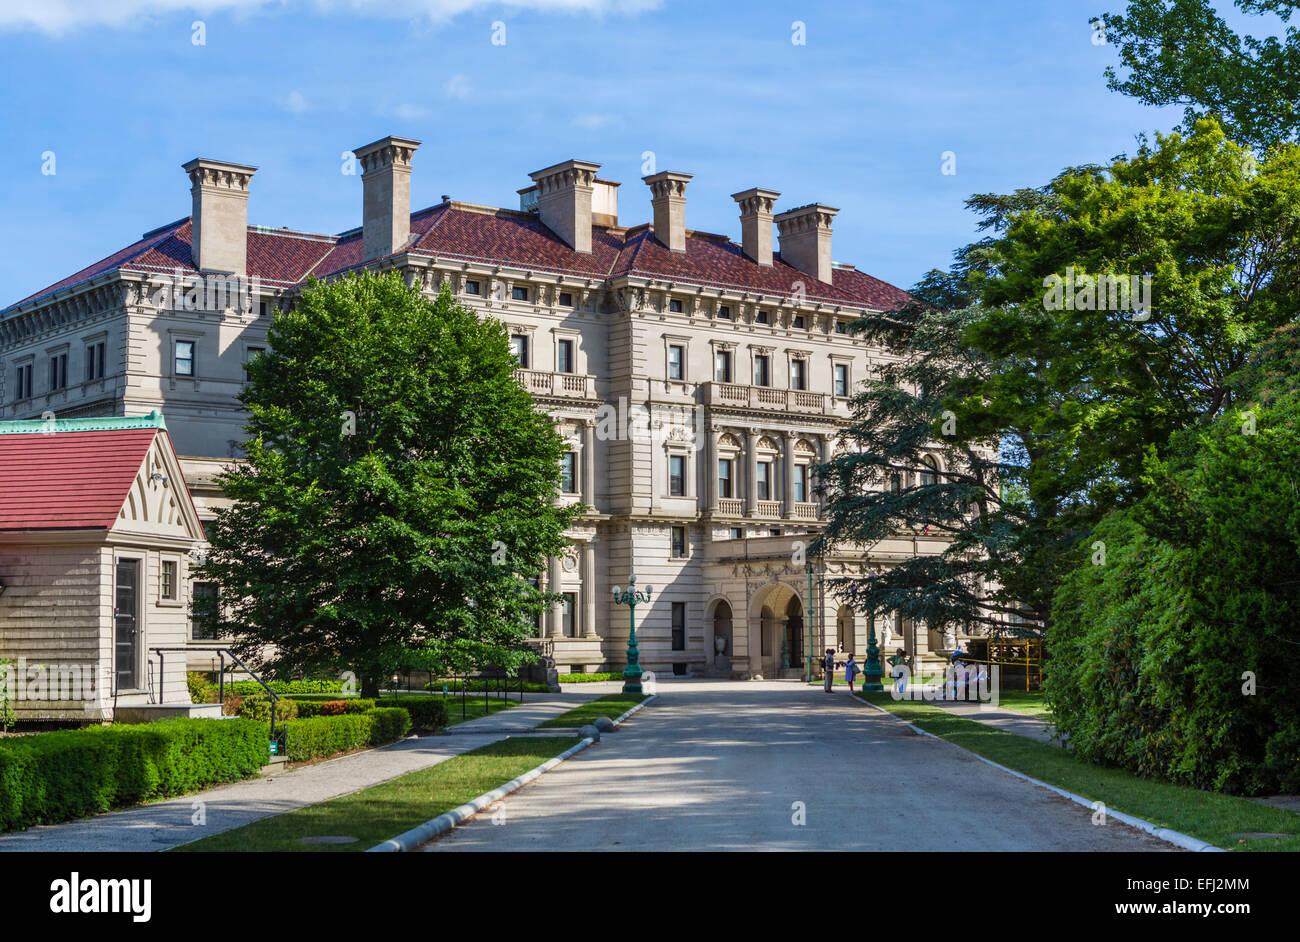 The Breakers, historic mansion and summer home of Cornelius Vanderbilt II, Newport, Rhode Island, USA - Stock Image